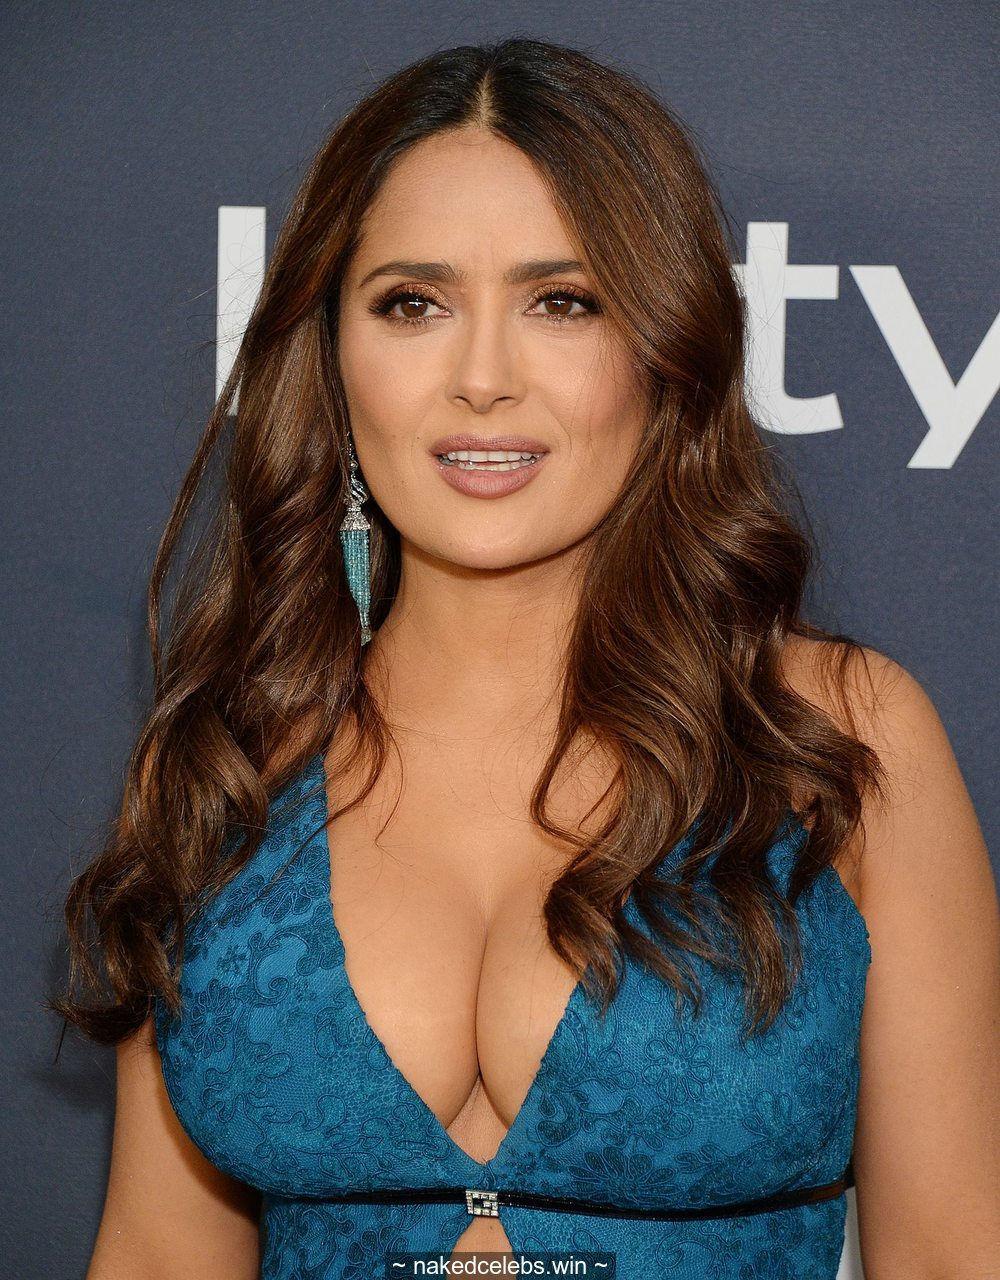 Busty Salma Hayek shows deep sexy cleavage